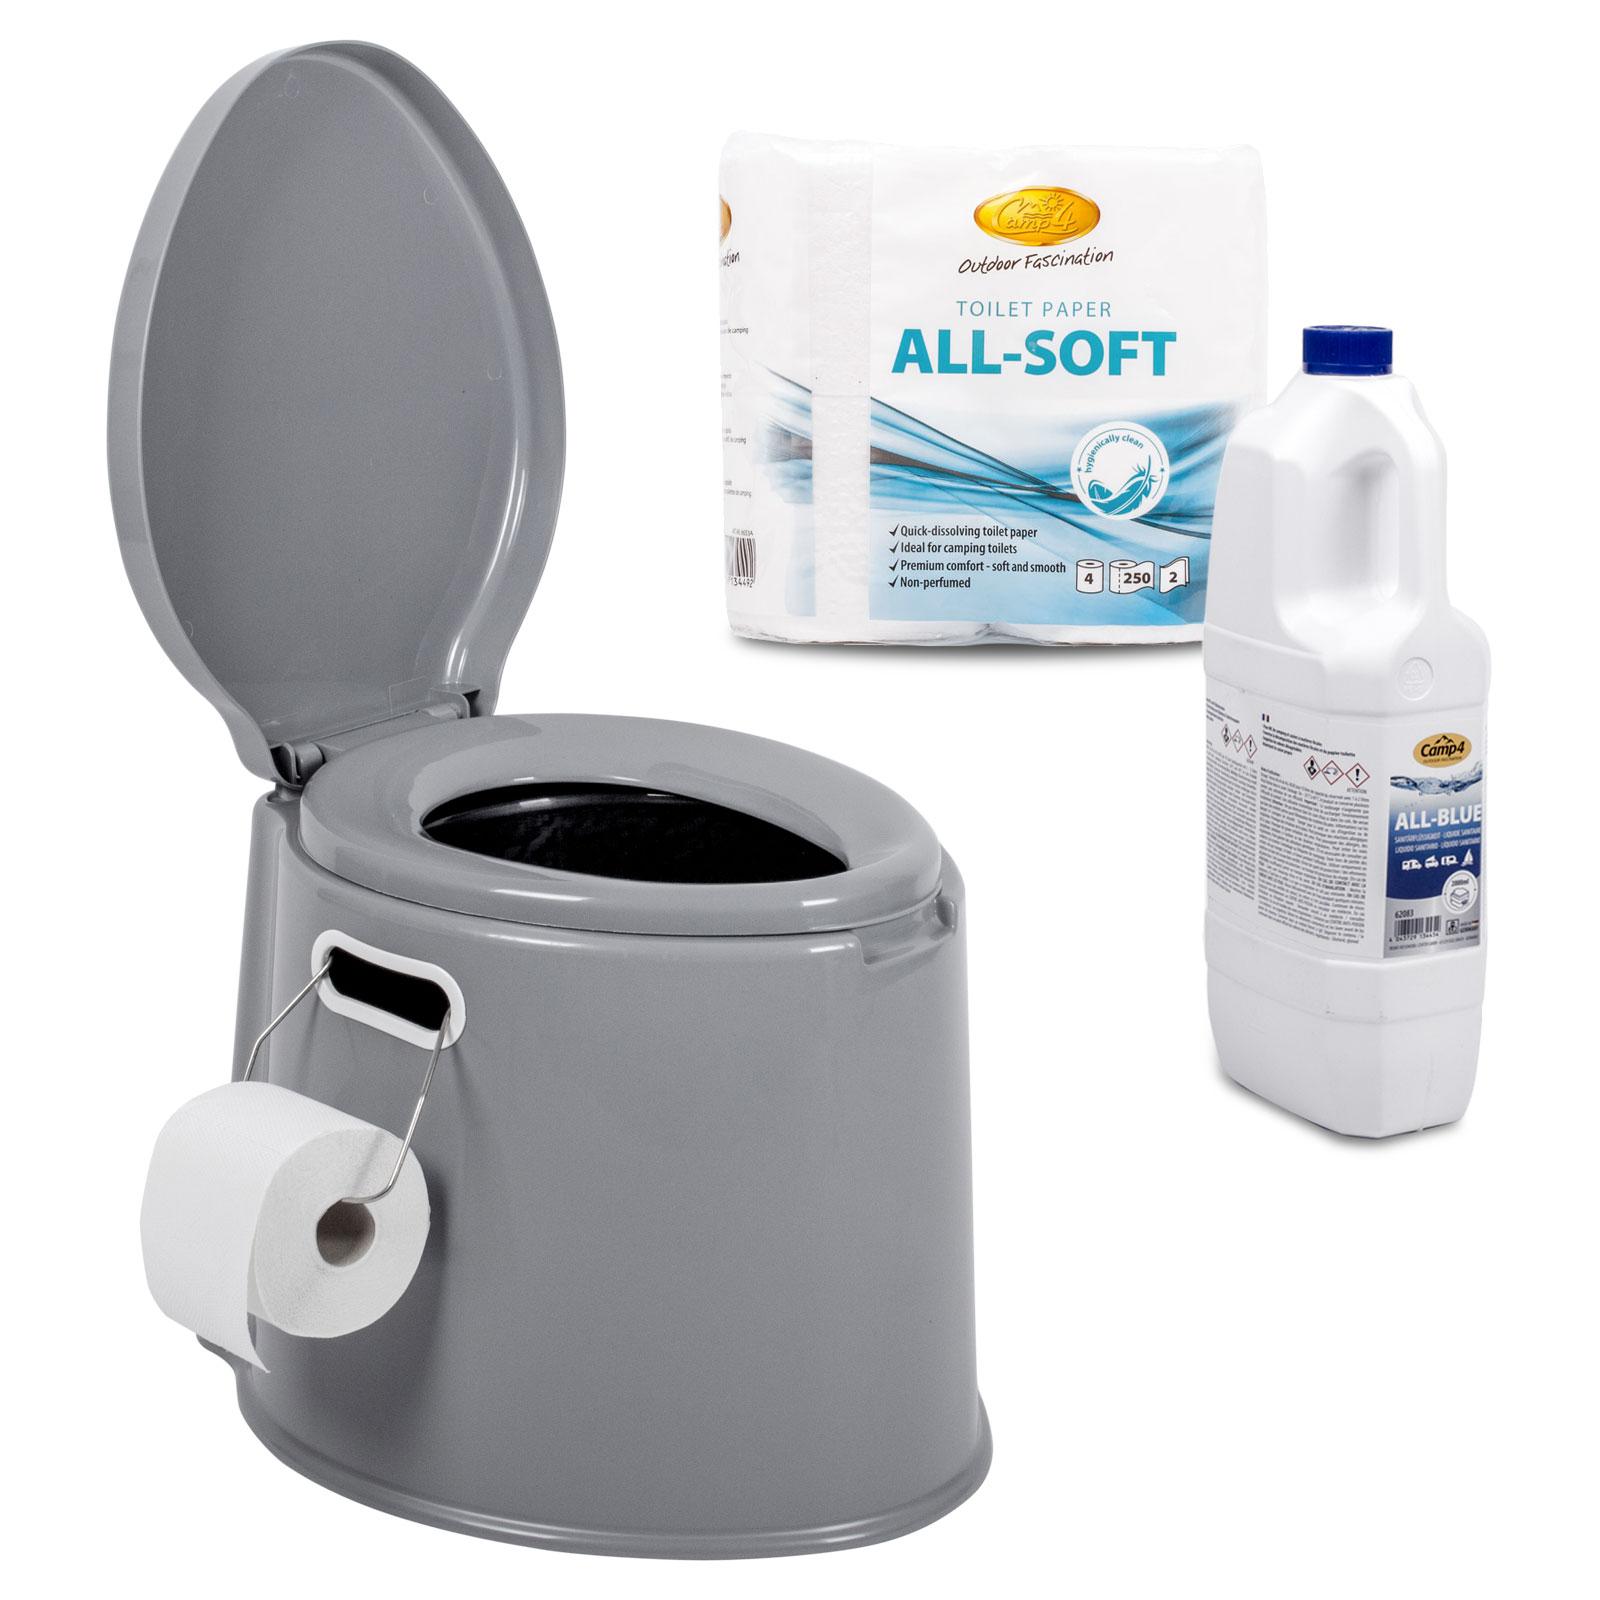 proplus campingtoiletten set camp4 toiletten fl ssigkeit. Black Bedroom Furniture Sets. Home Design Ideas